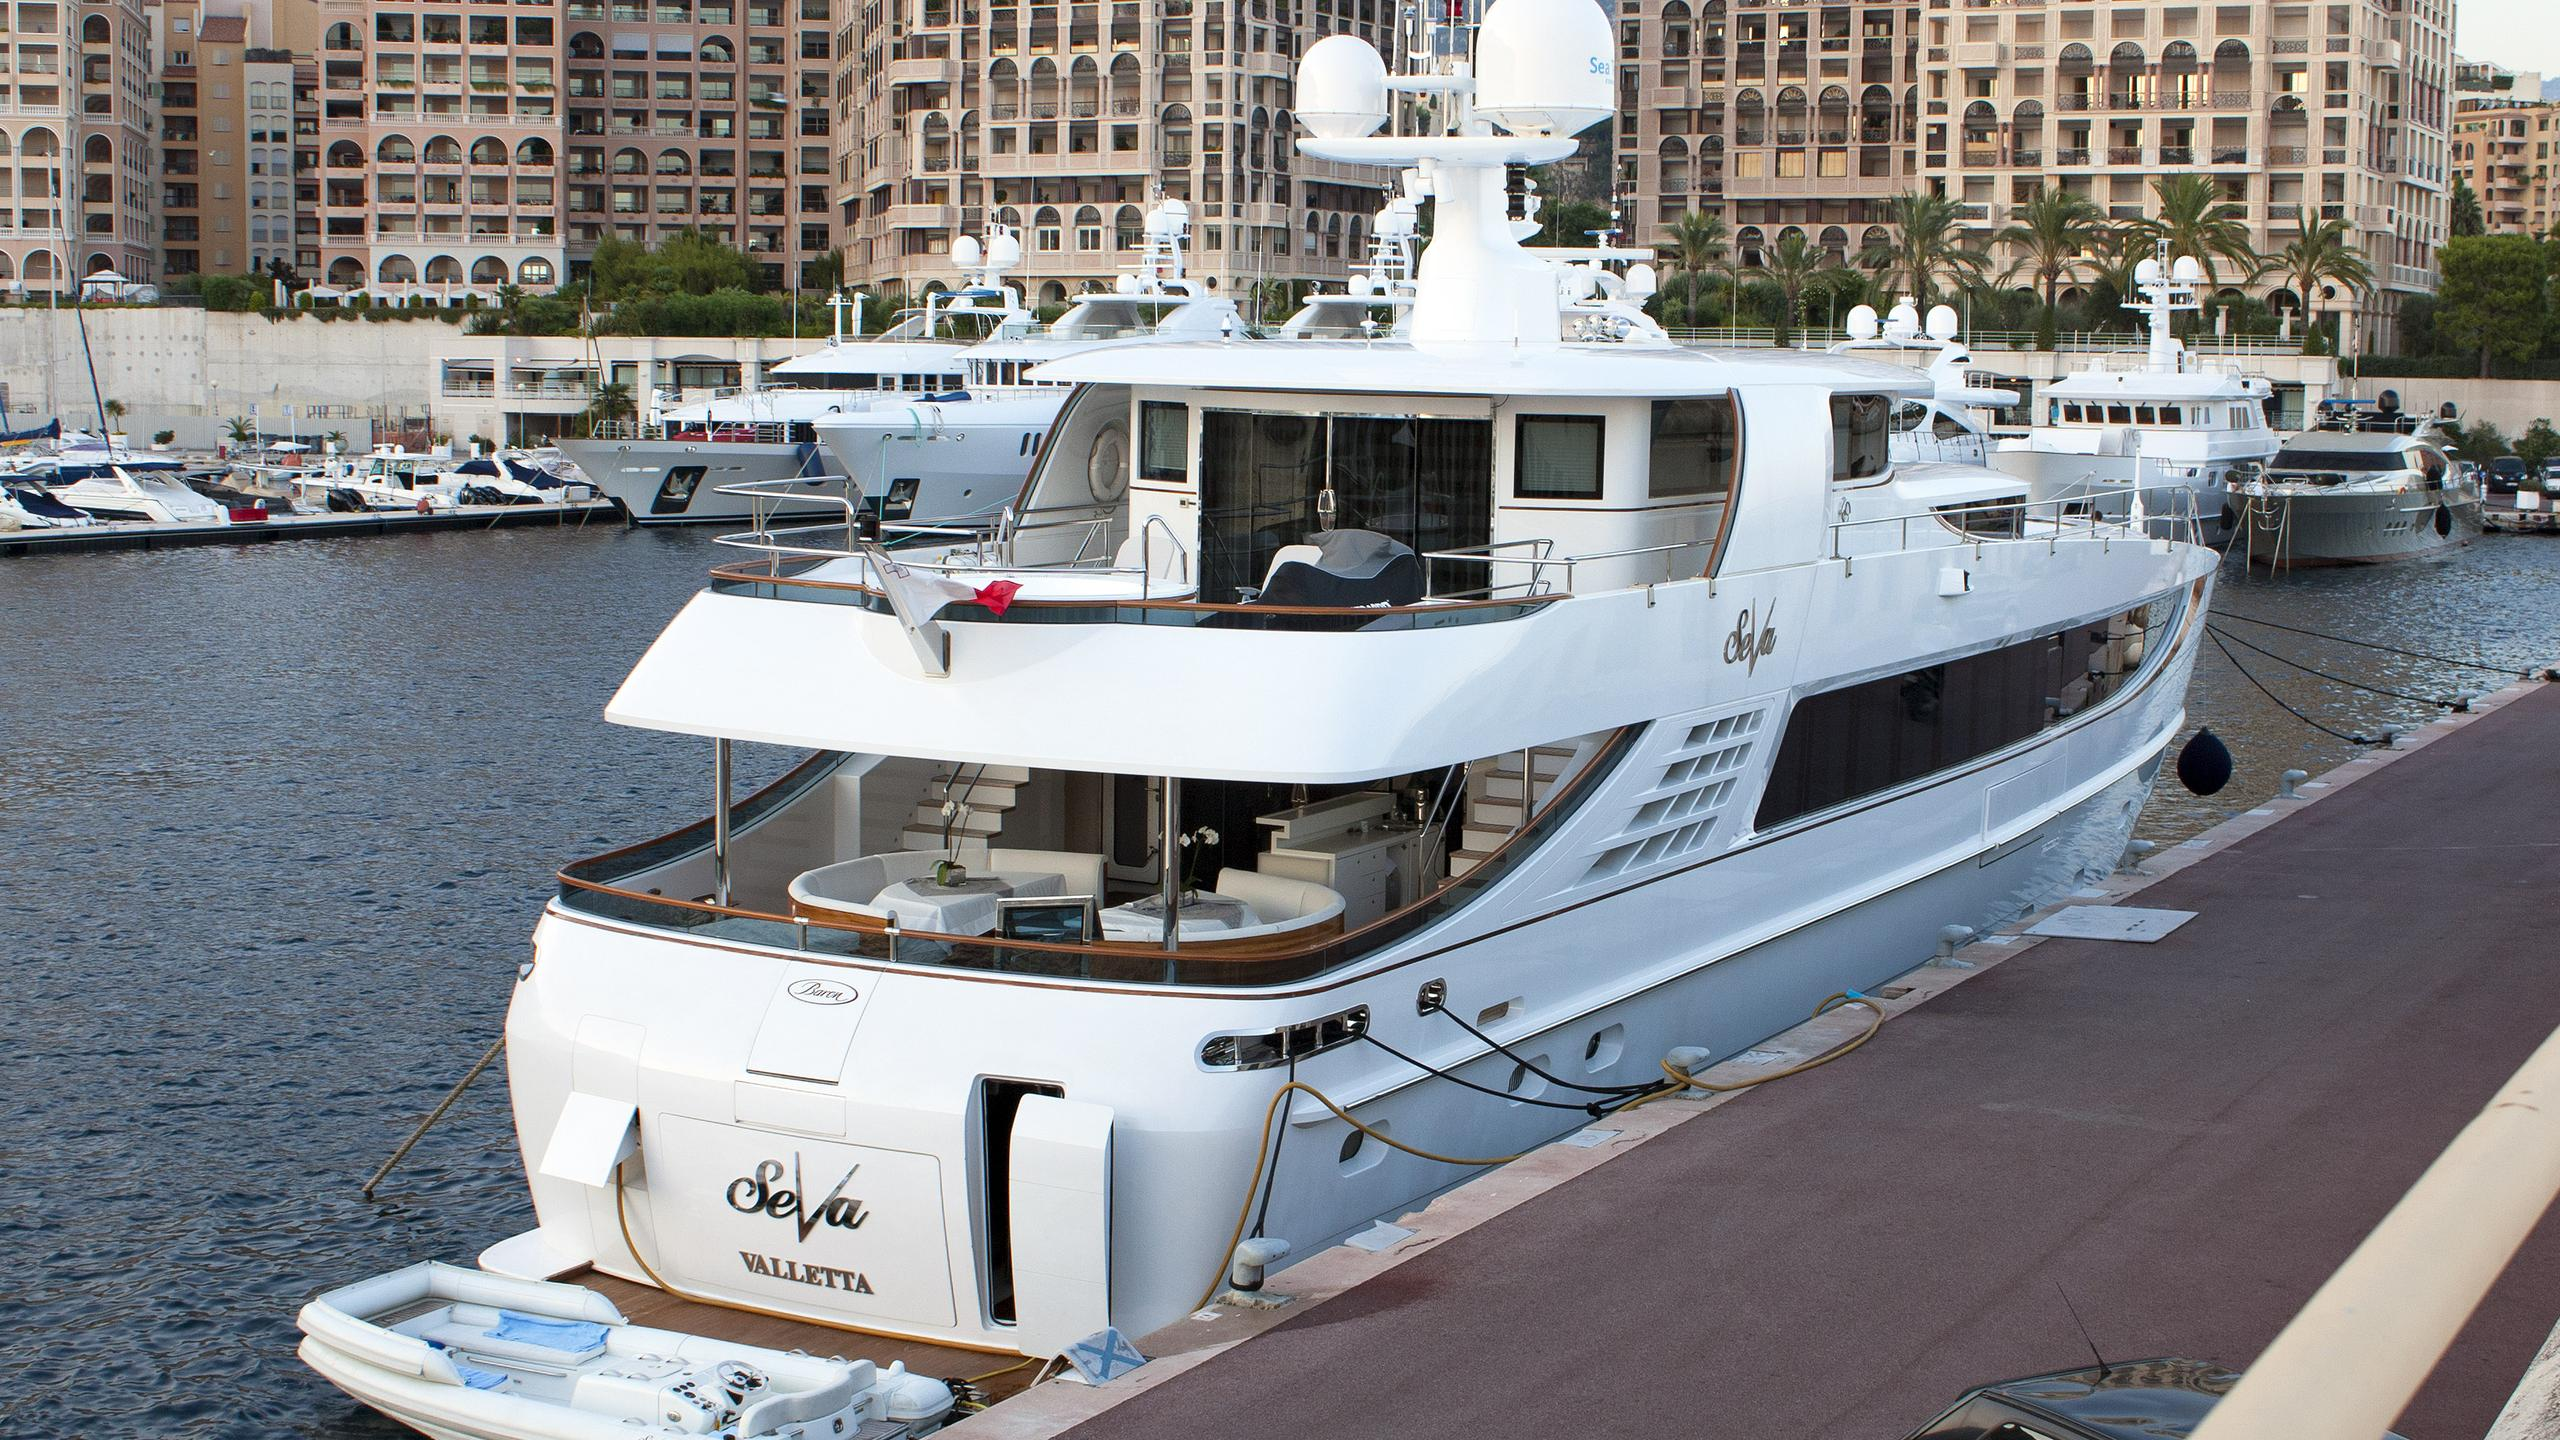 seva-motor-yacht-kaiserwerft-baron-40-5-2006-41m-half-profile